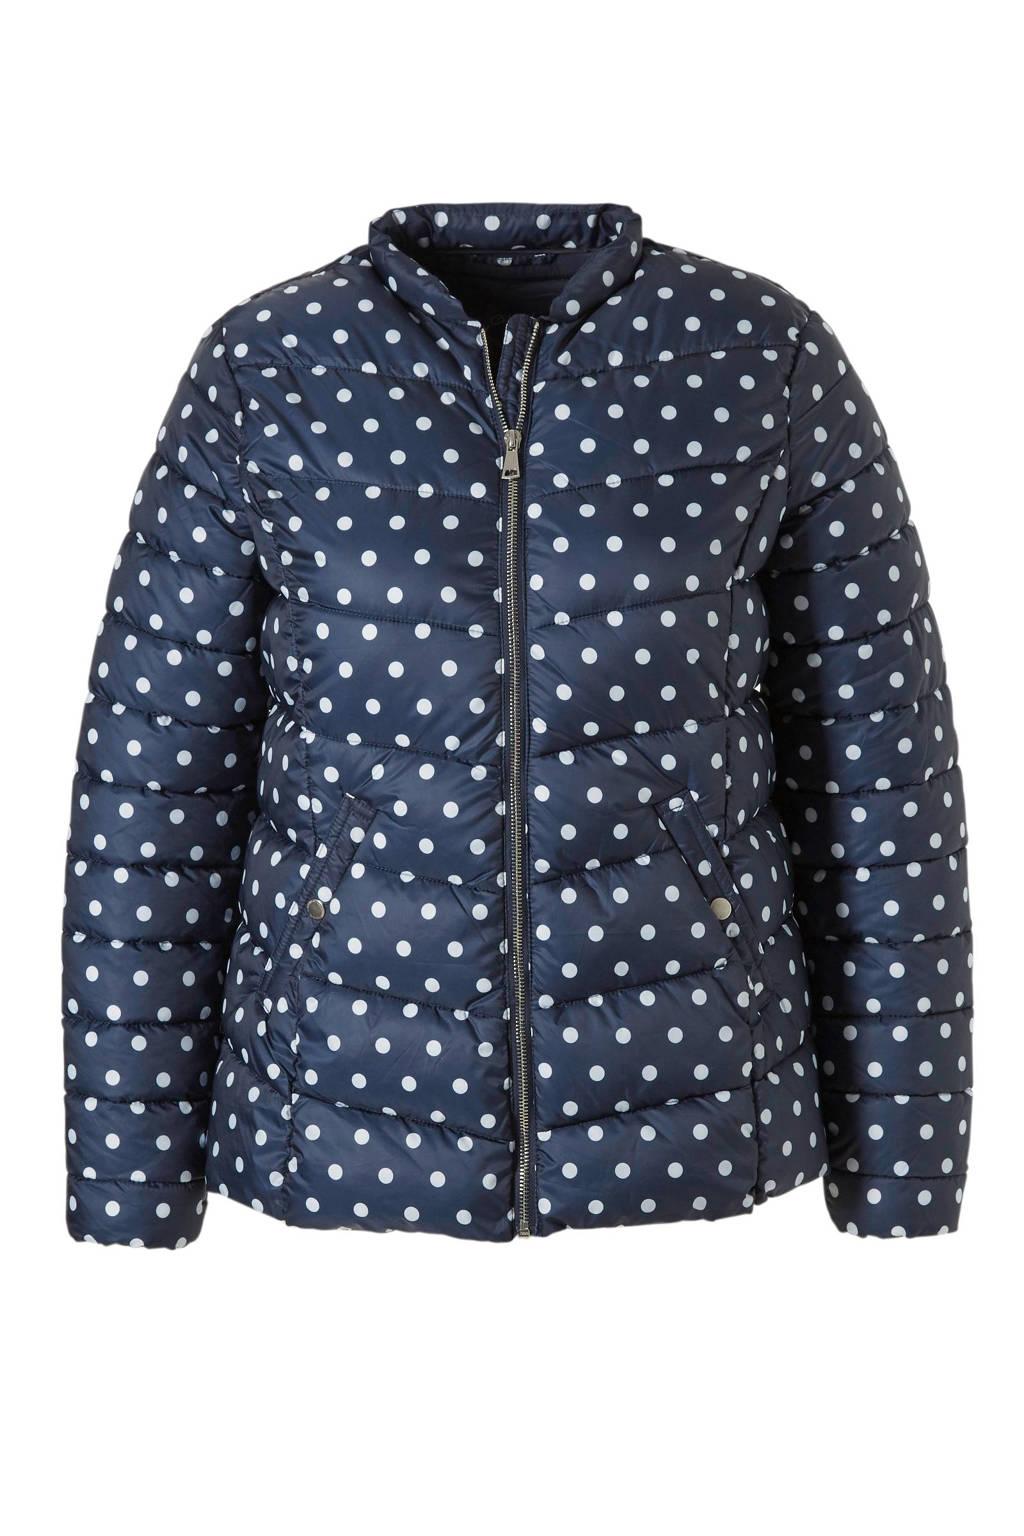 C&A XL Clockhouse gewatteerde jas met stippen, Donkerblauw